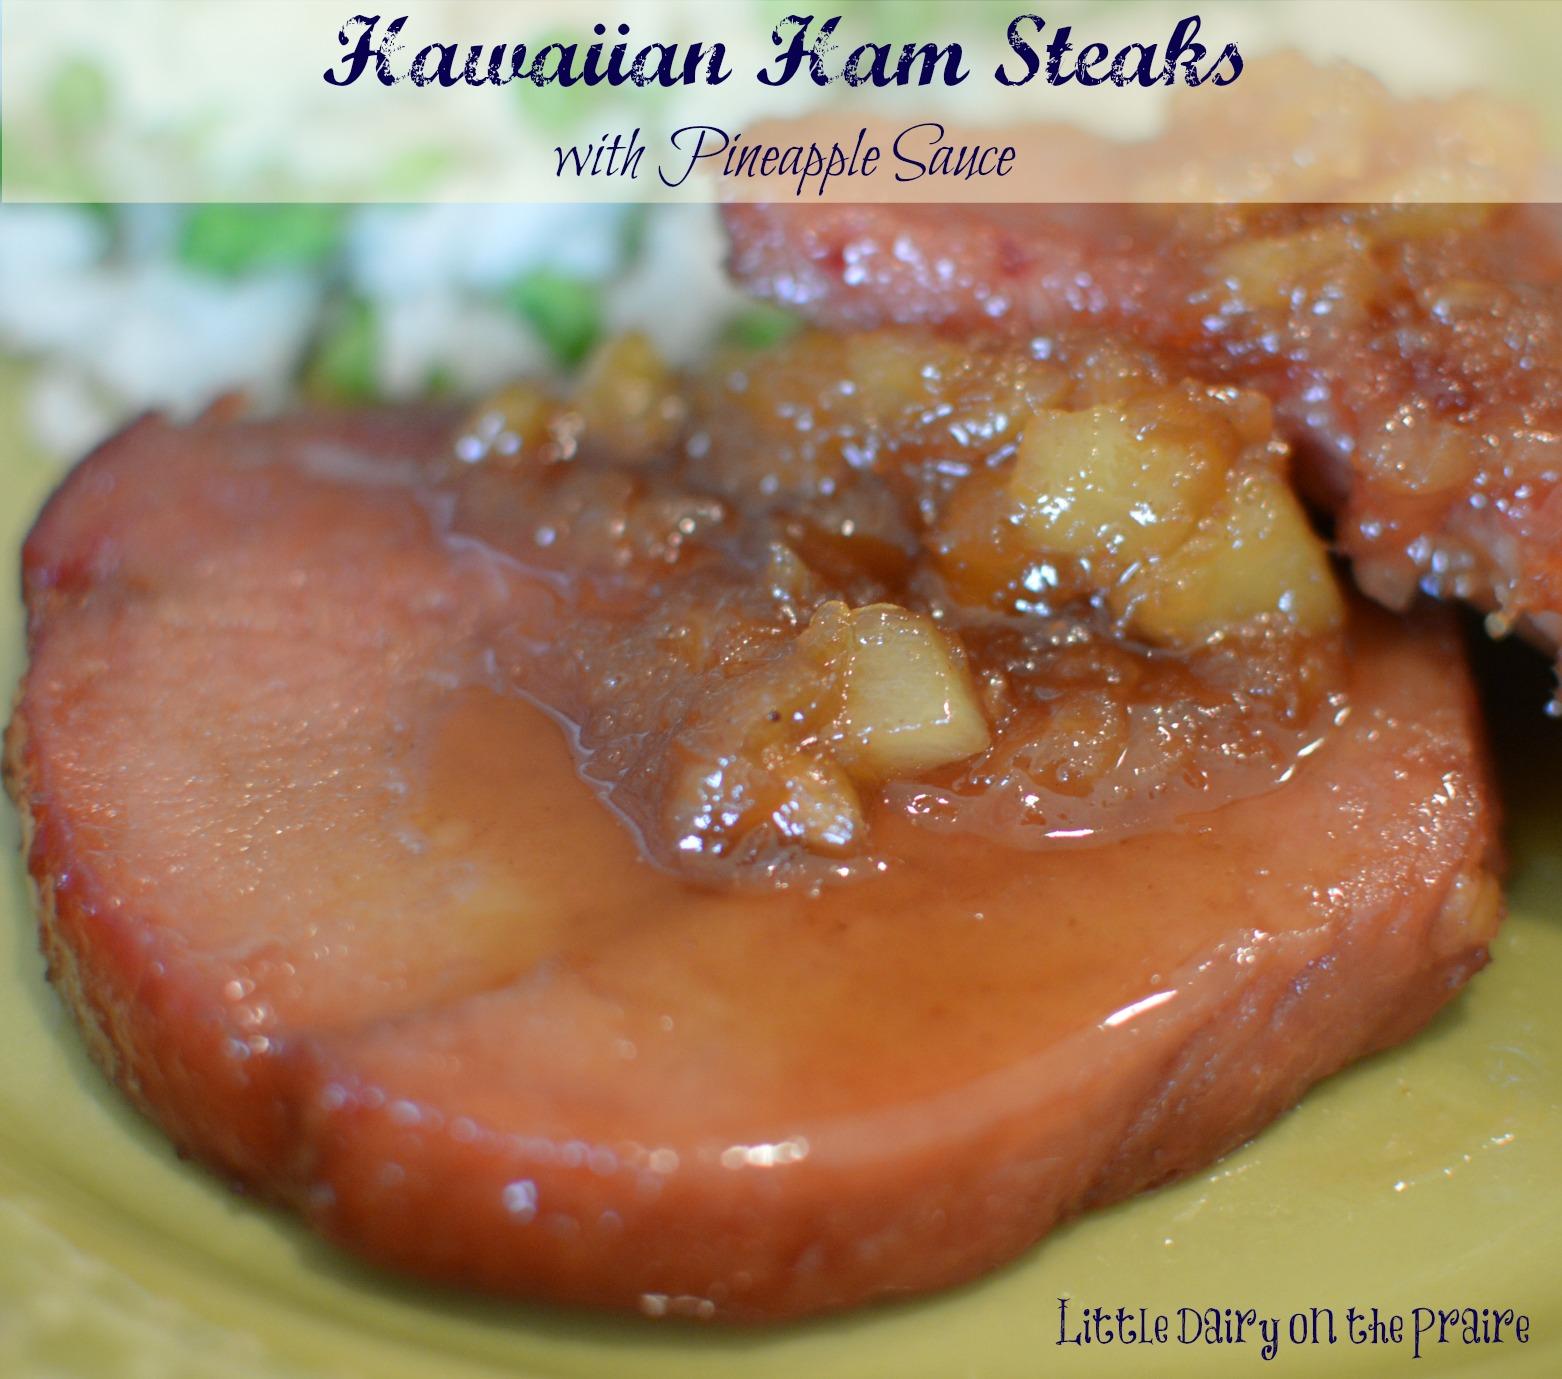 Hawaiian Ham Steaks with Pineapple Sauce